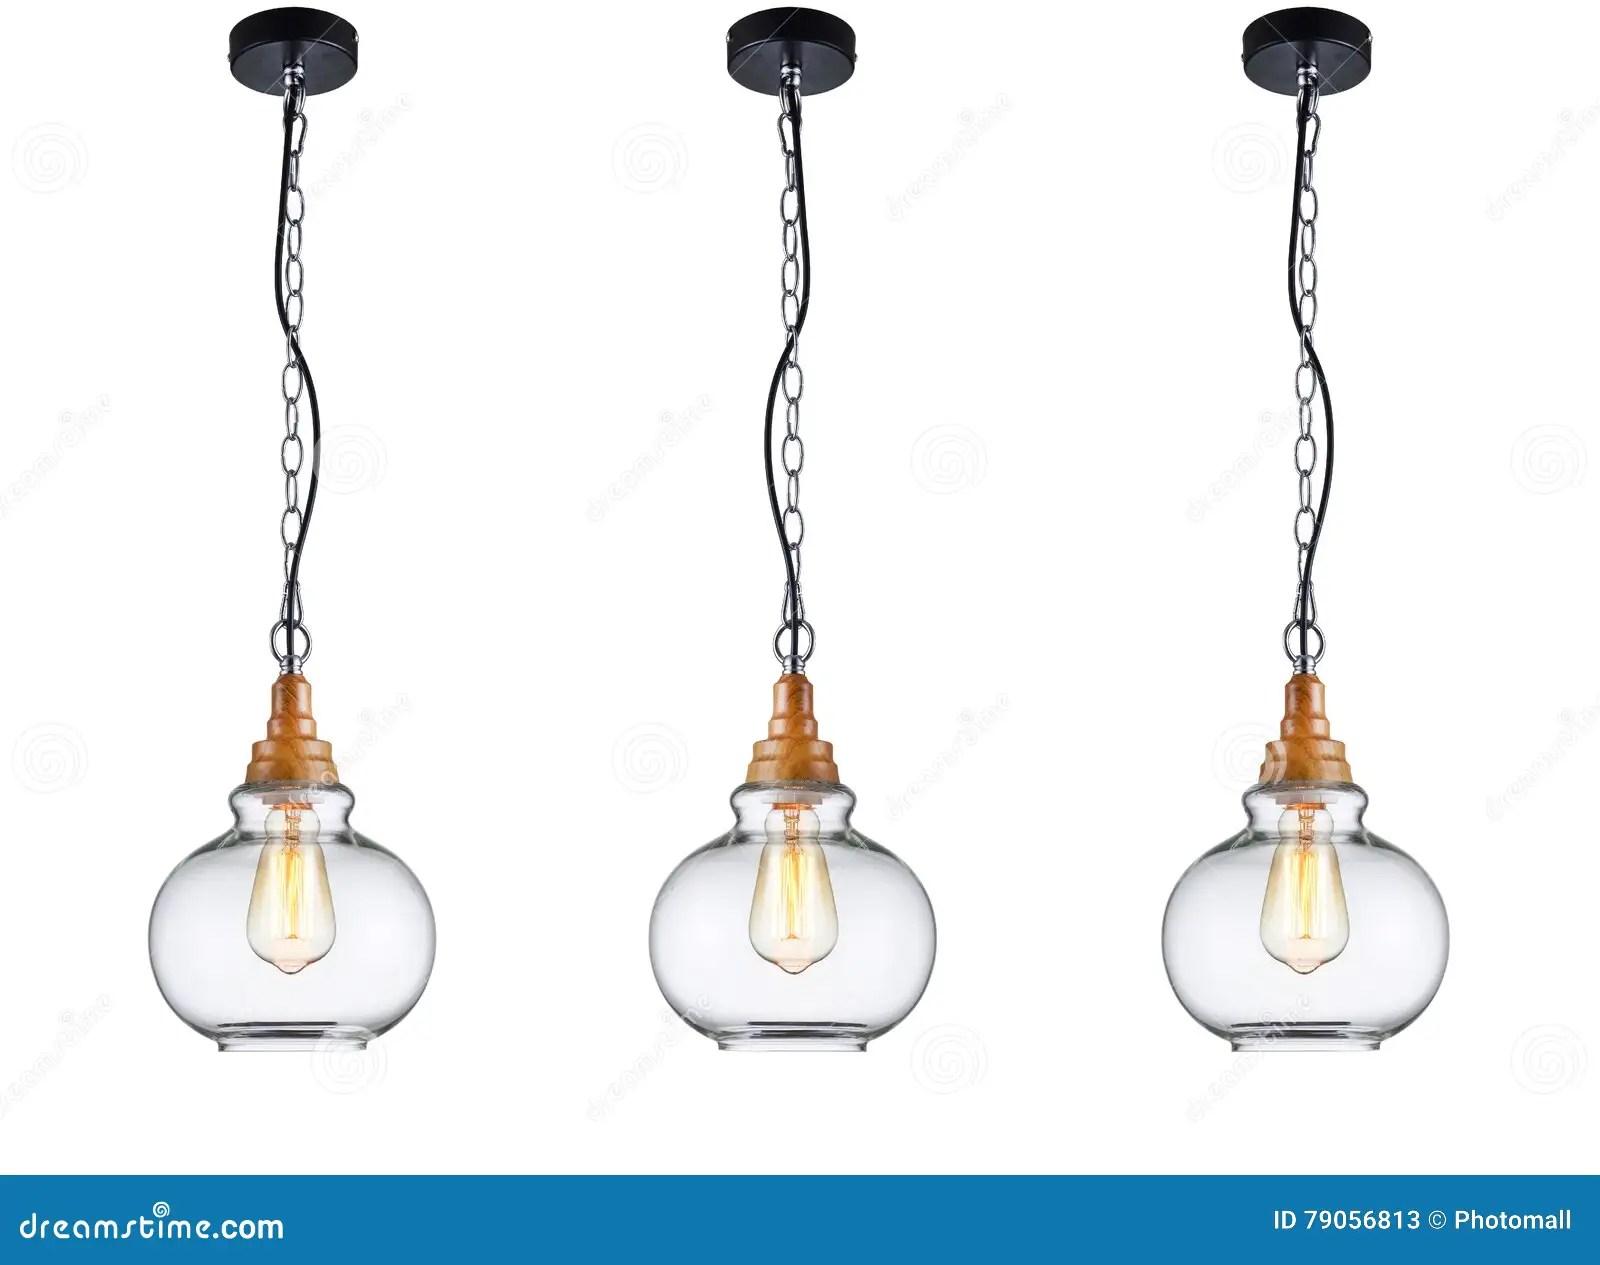 Led Lighting Stock Image Image Of Ball Bulbs Commercial